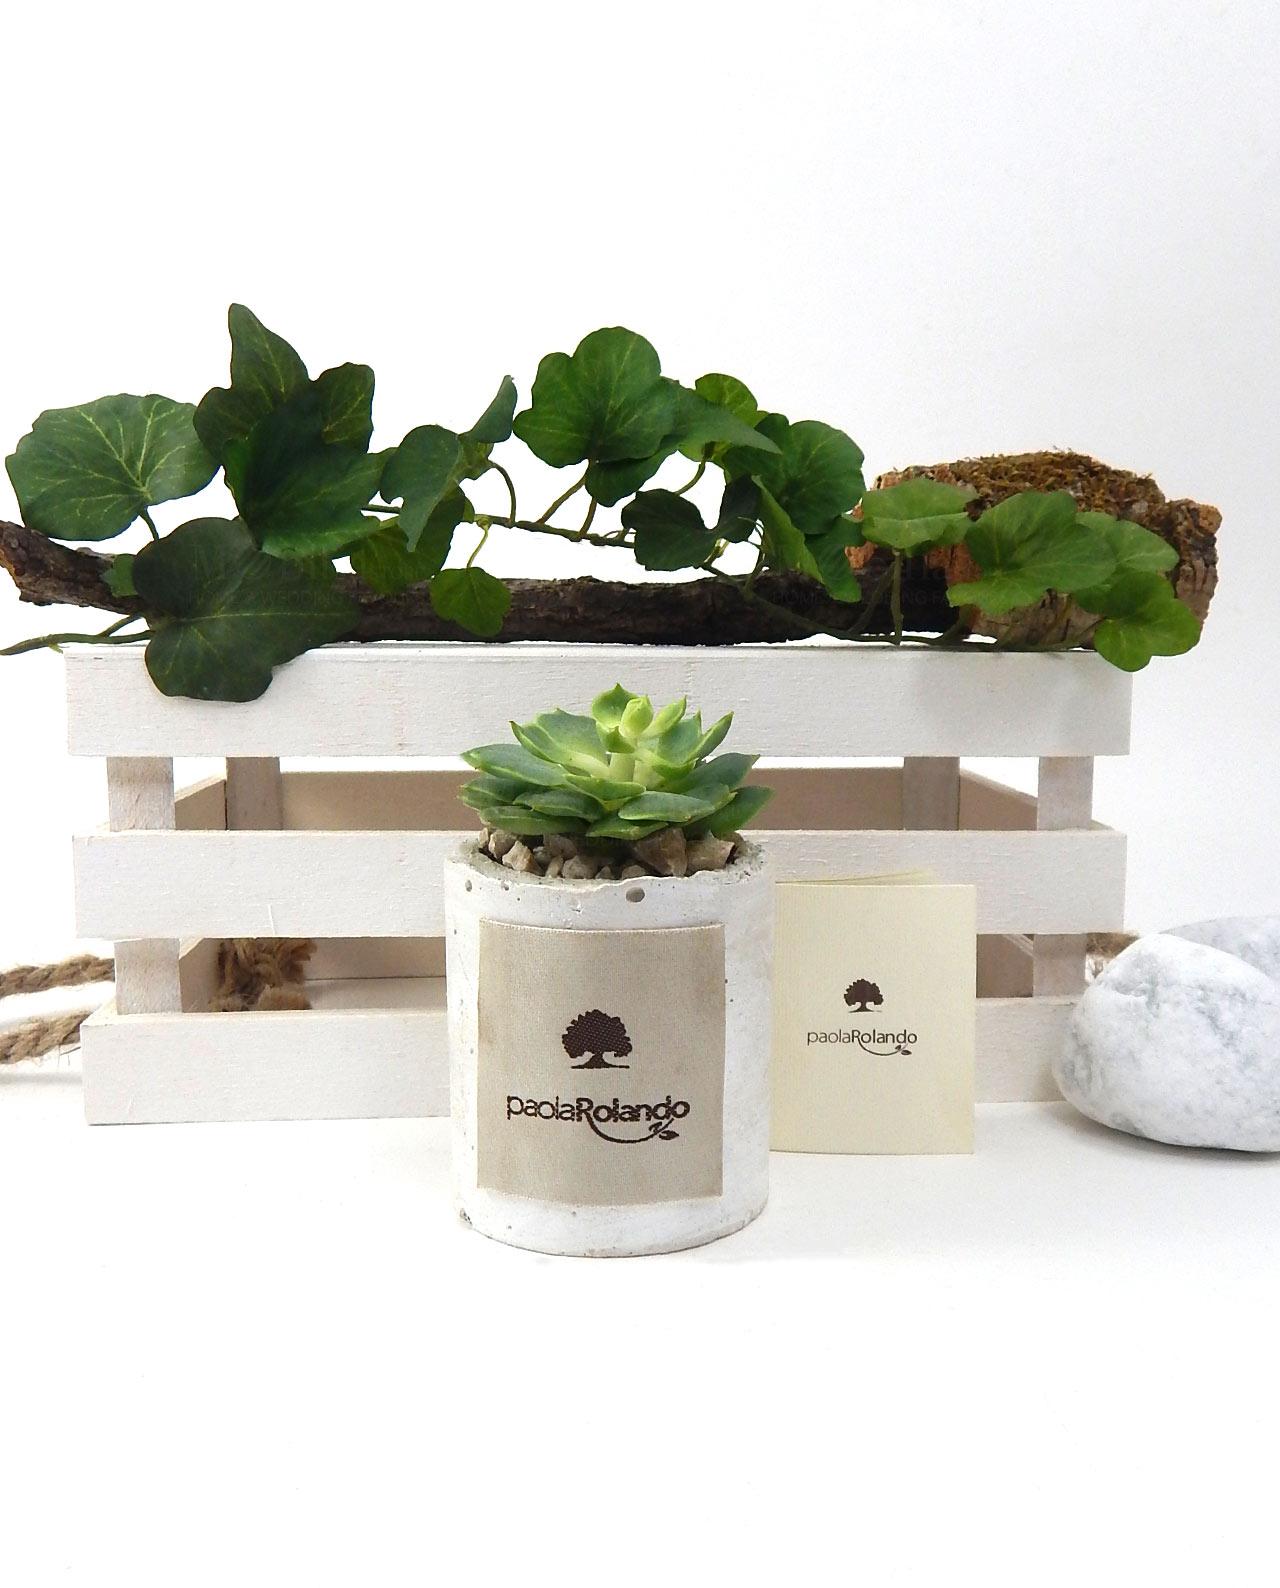 Bomboniera piantina grassa vaso bianco Paola Rolando - Mobilia Store Home & Favours